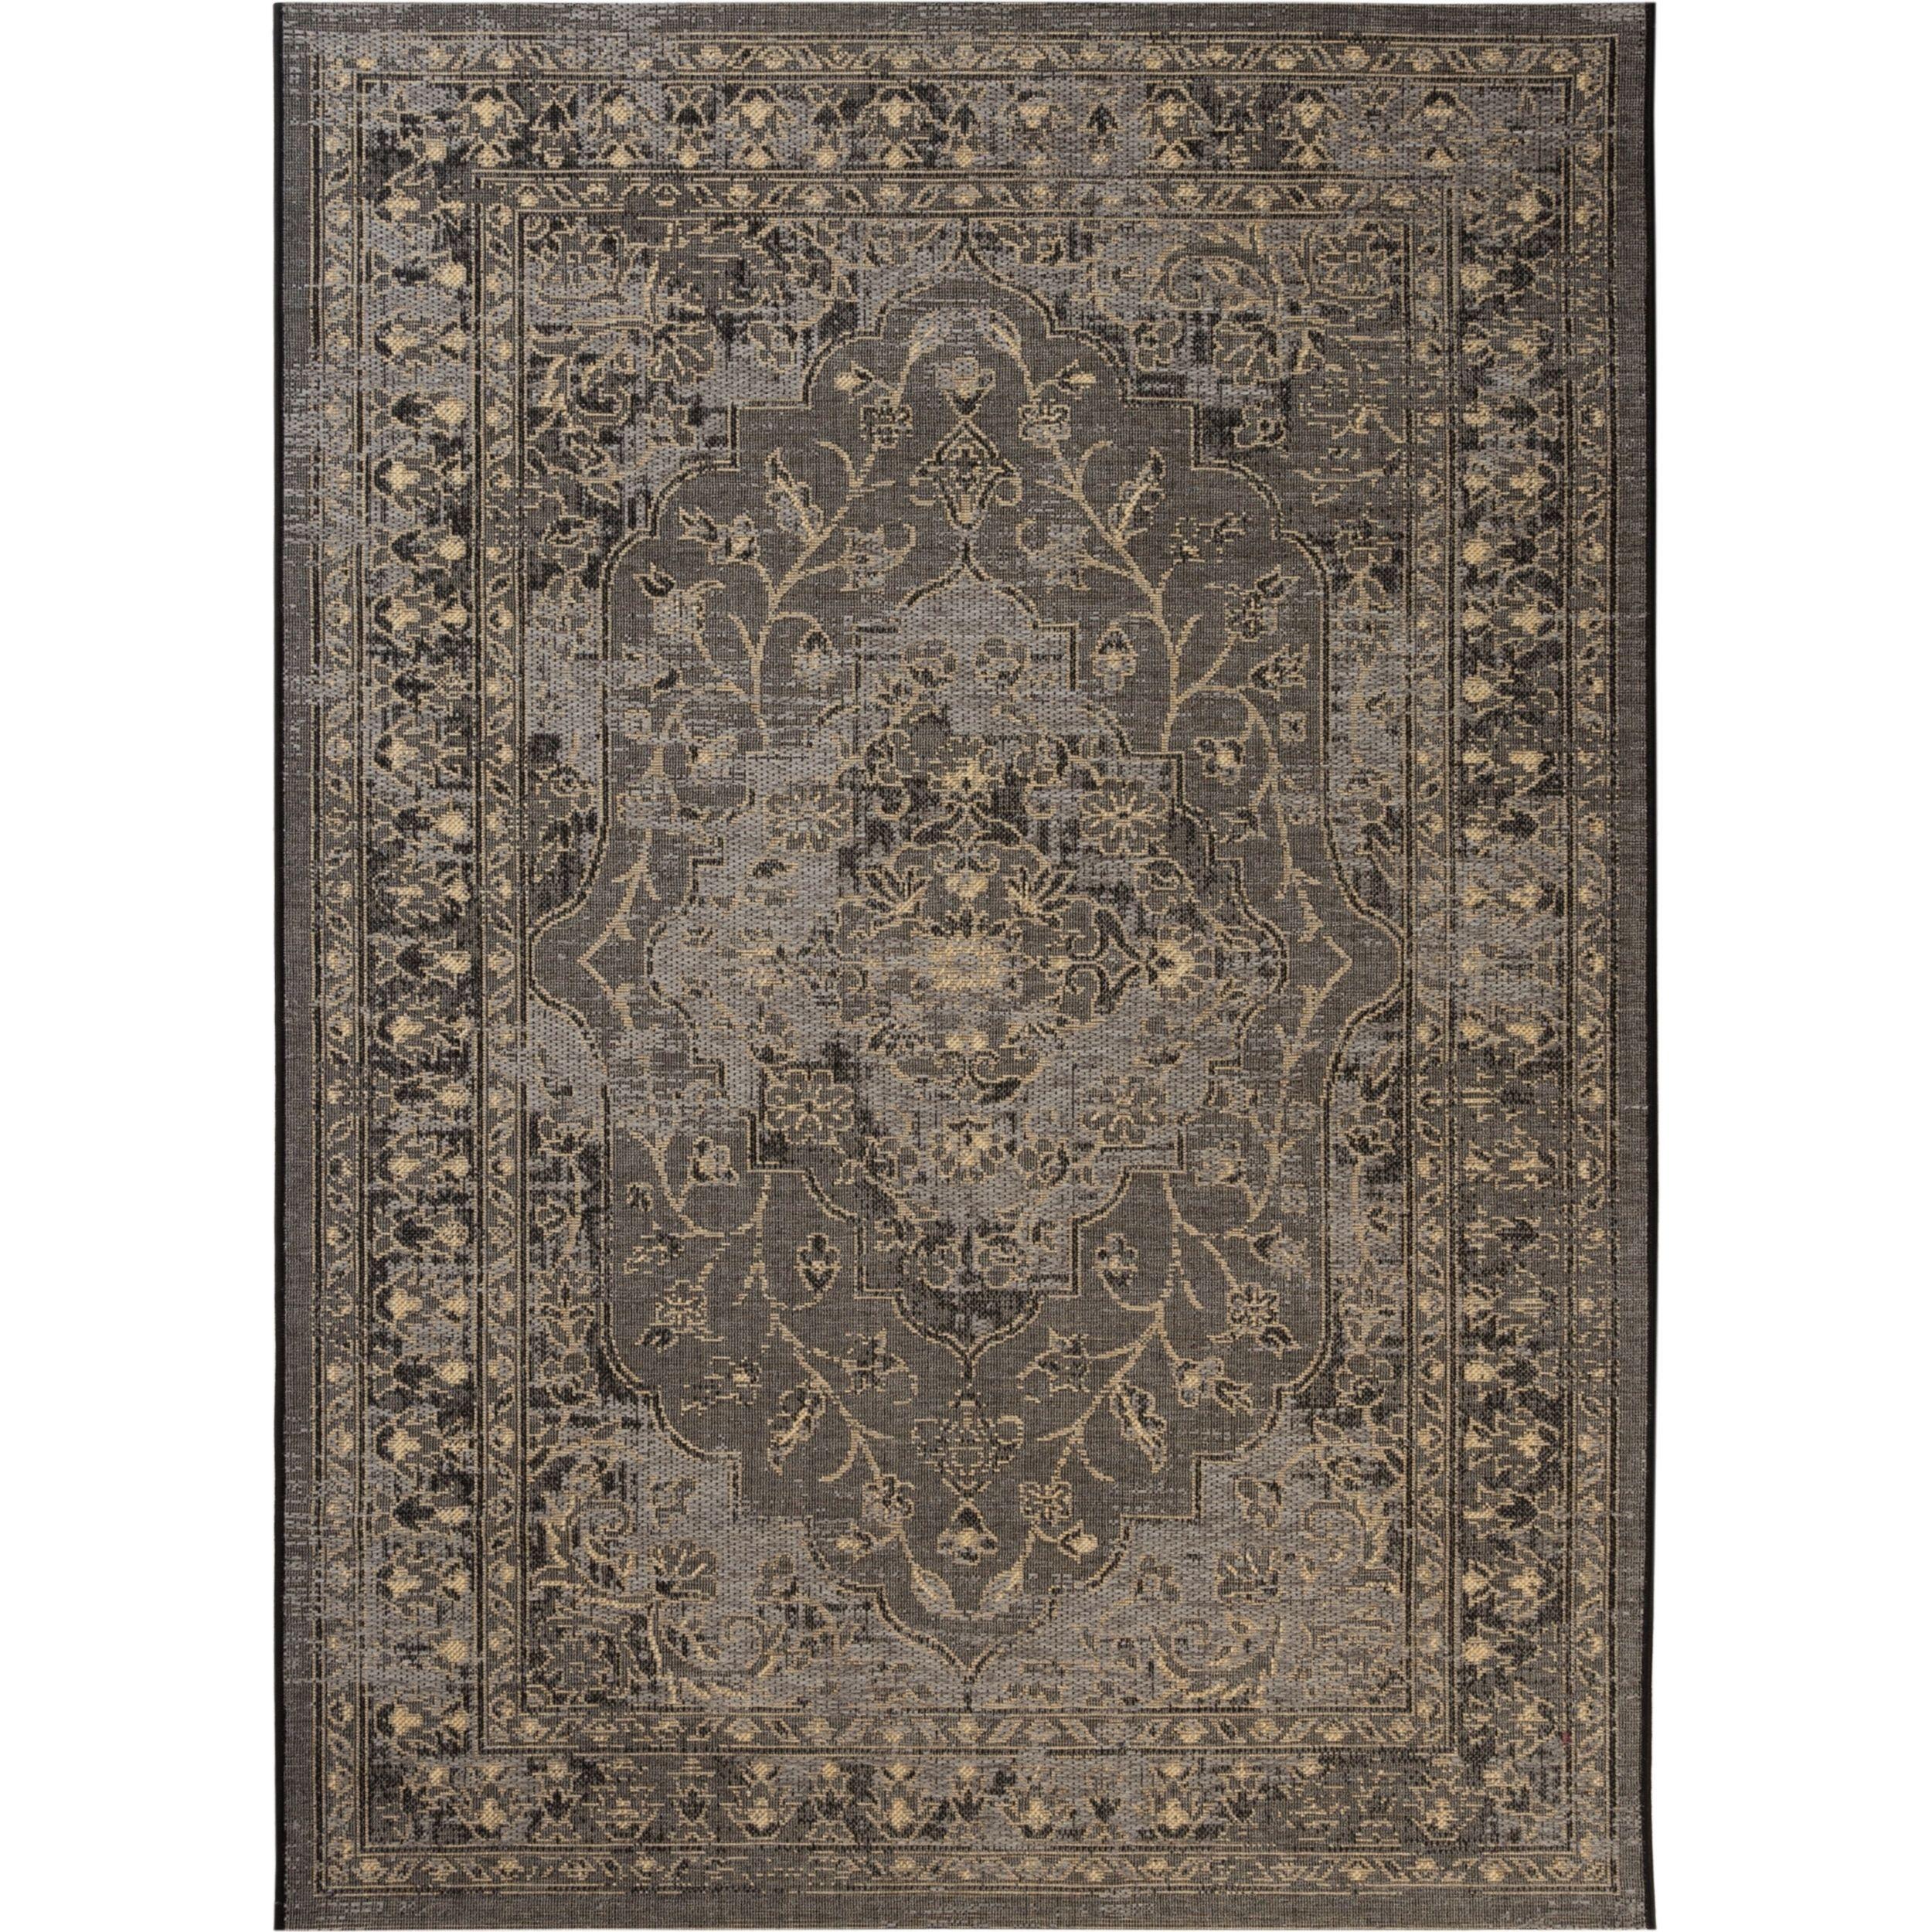 Safavieh Palazzo Black/ Cream Rug (8u0027 X 11u0027) (PAL128 16217 8), Size 8u0027 X  11u0027 (Chenille, Oriental)